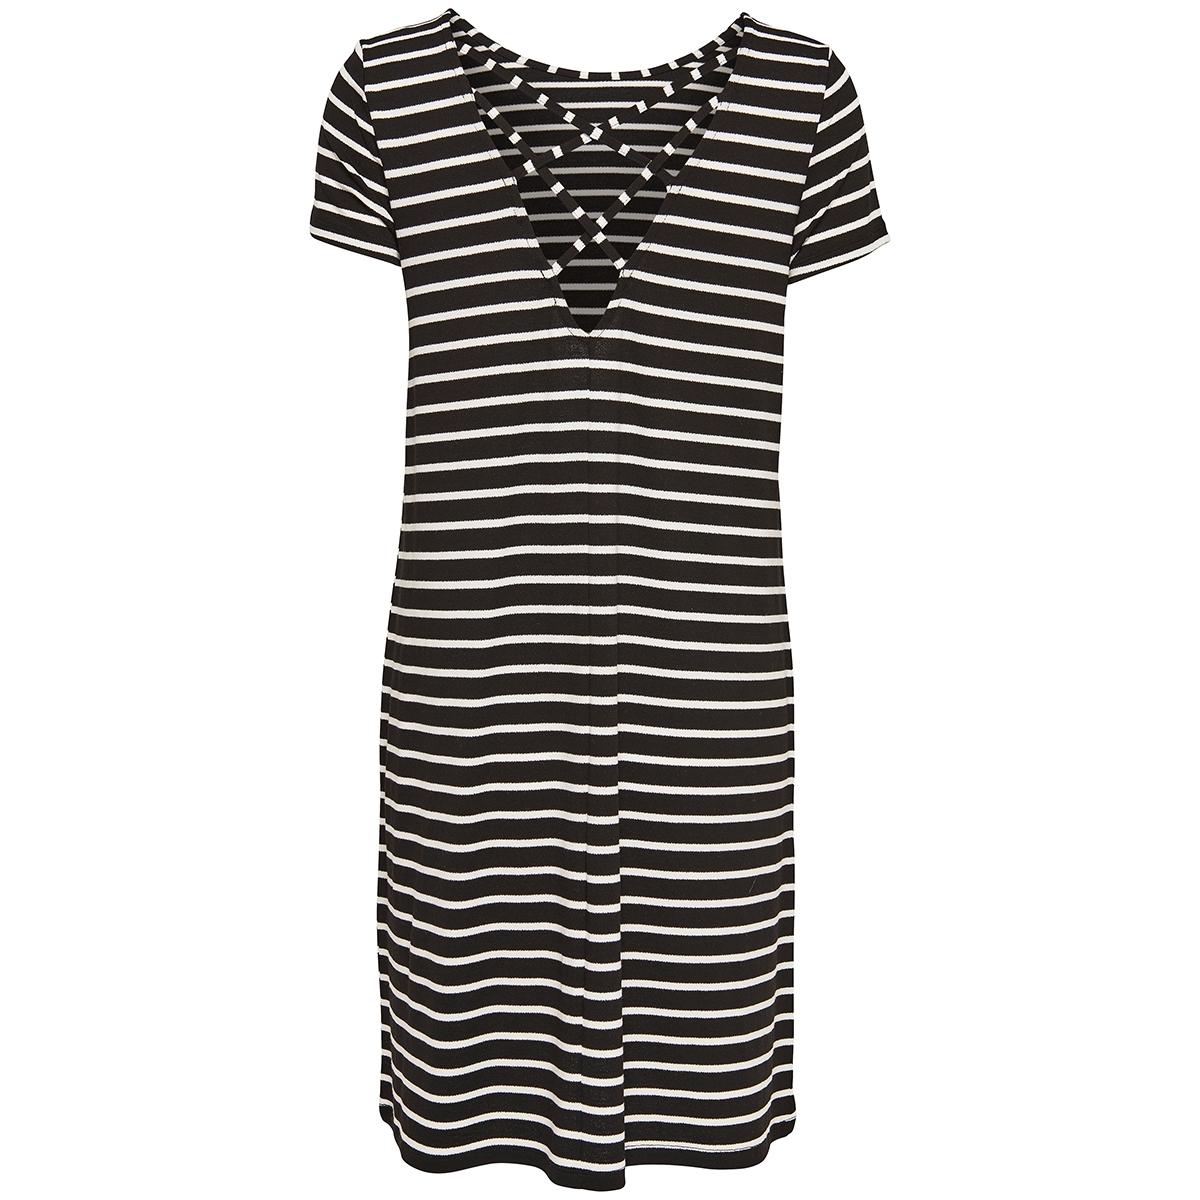 onlbera back lace up s/s dress jrs 15131237 only jurk black/cloud dancer